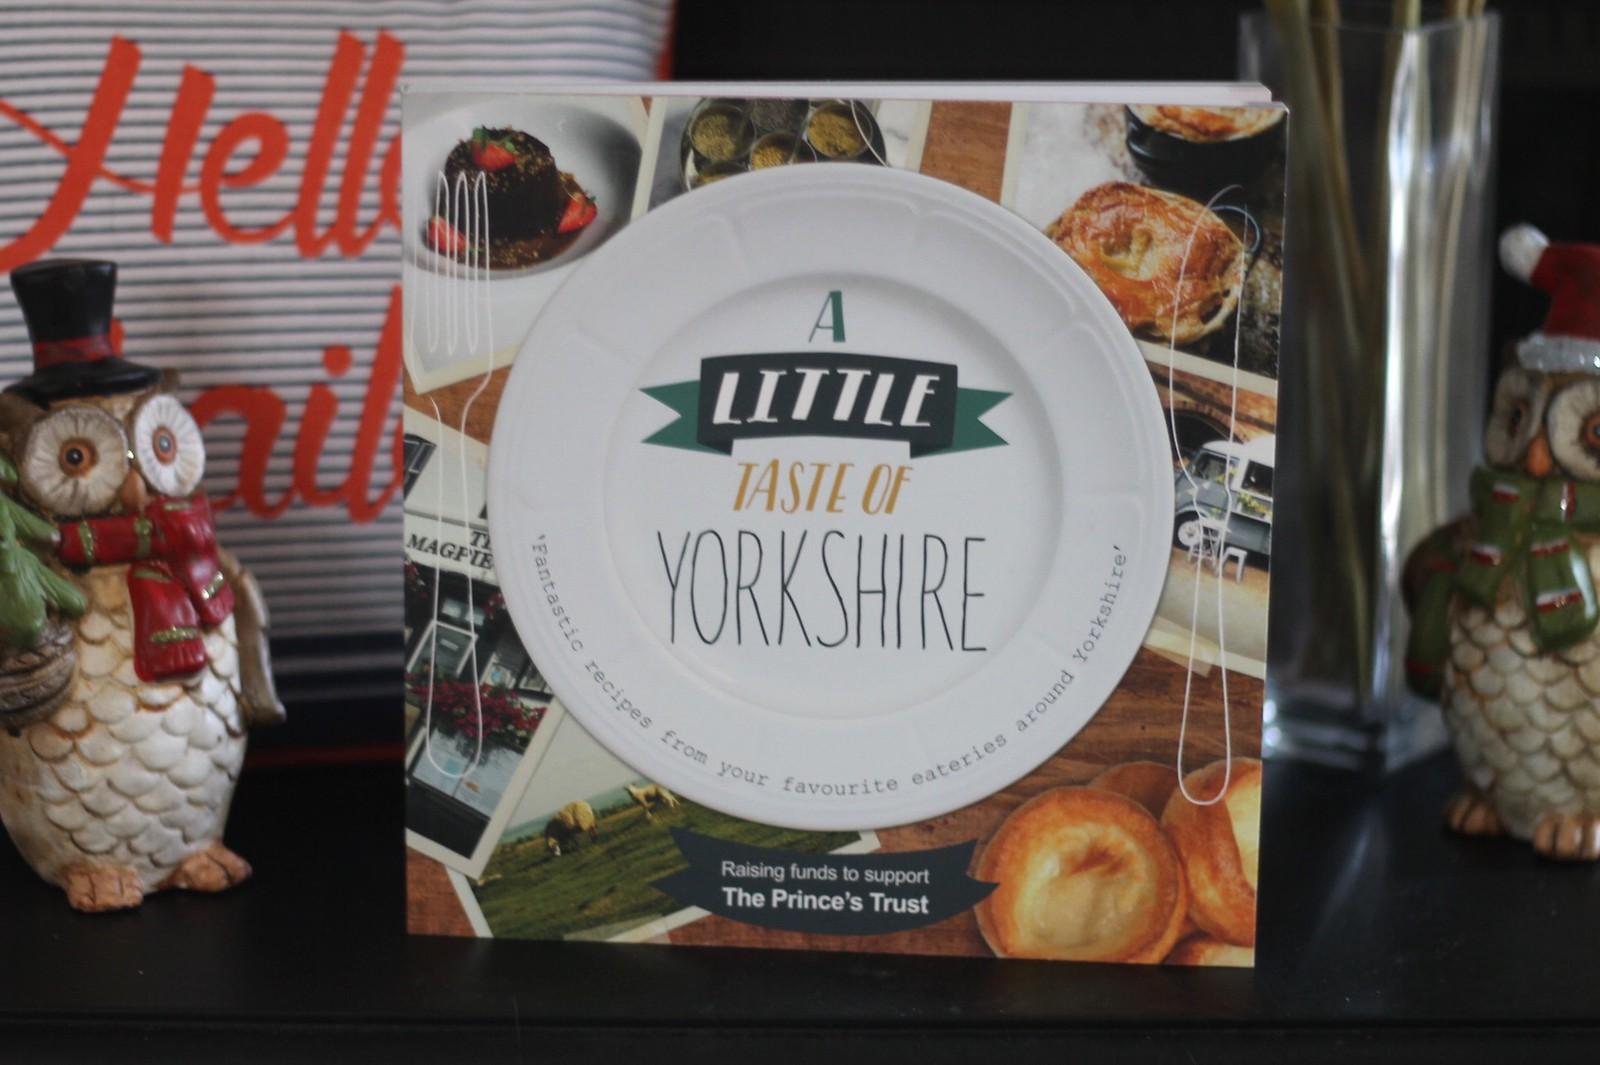 A Little Taste of Yorkshire